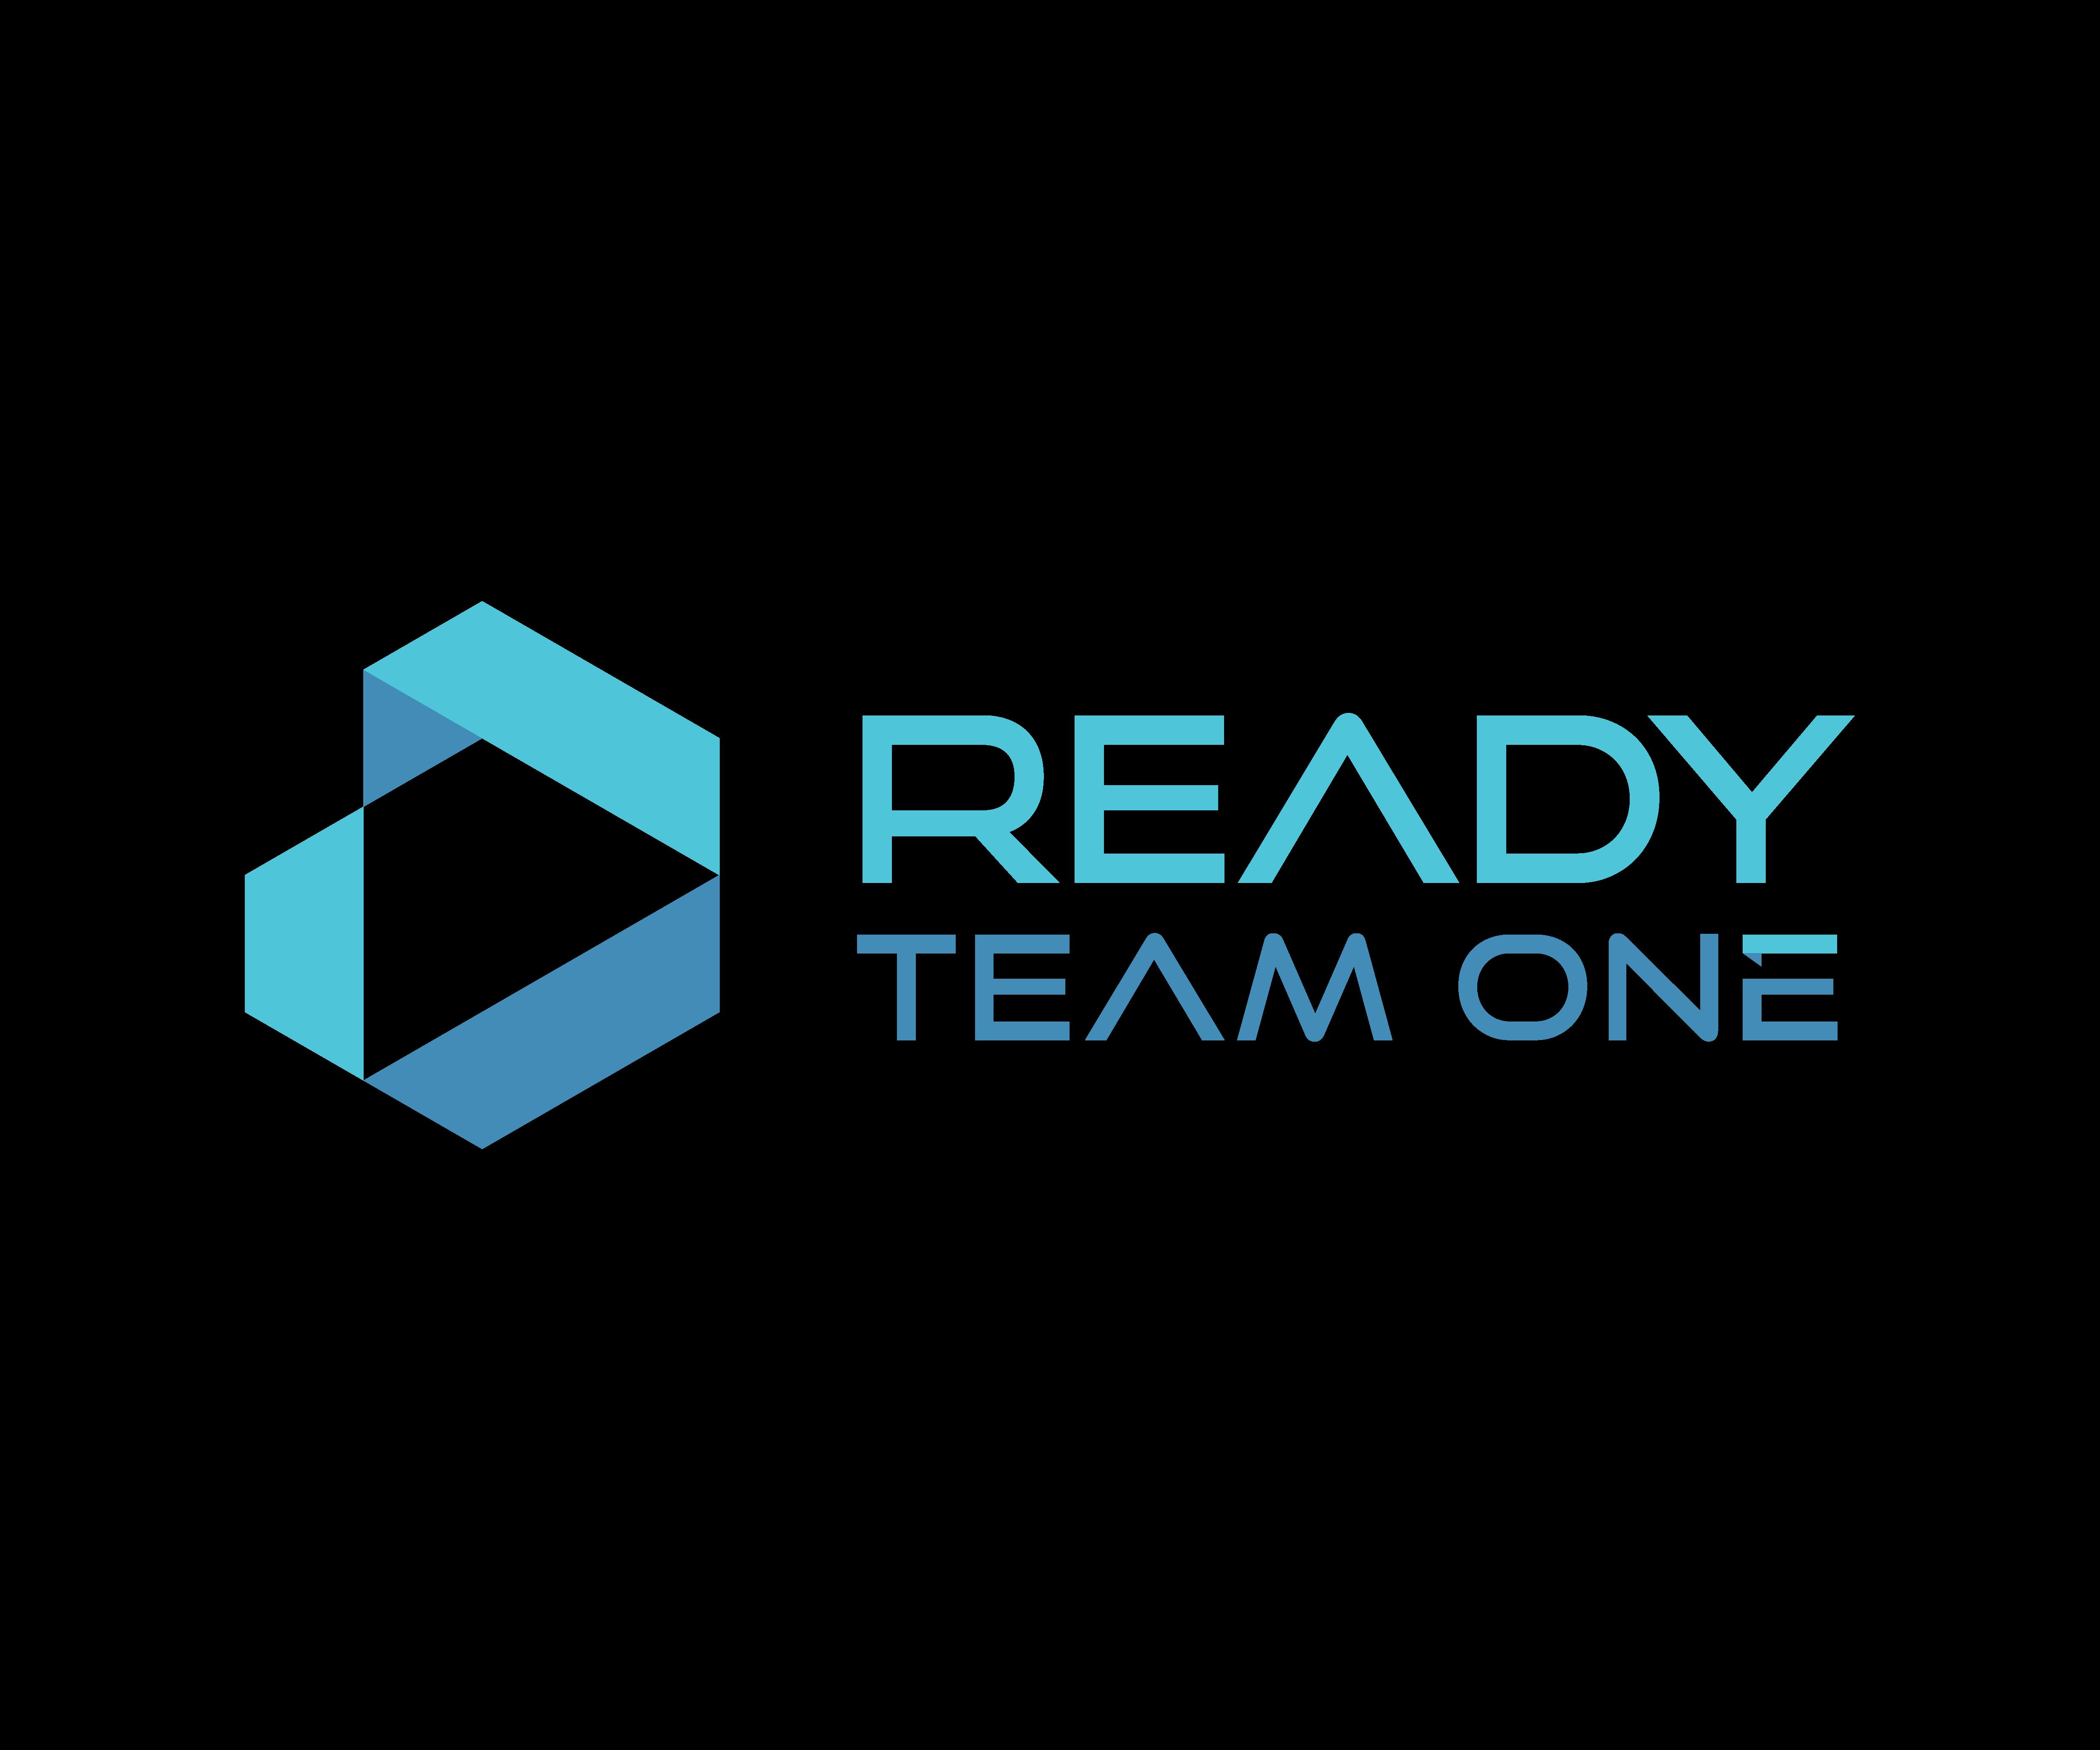 Ready Team One